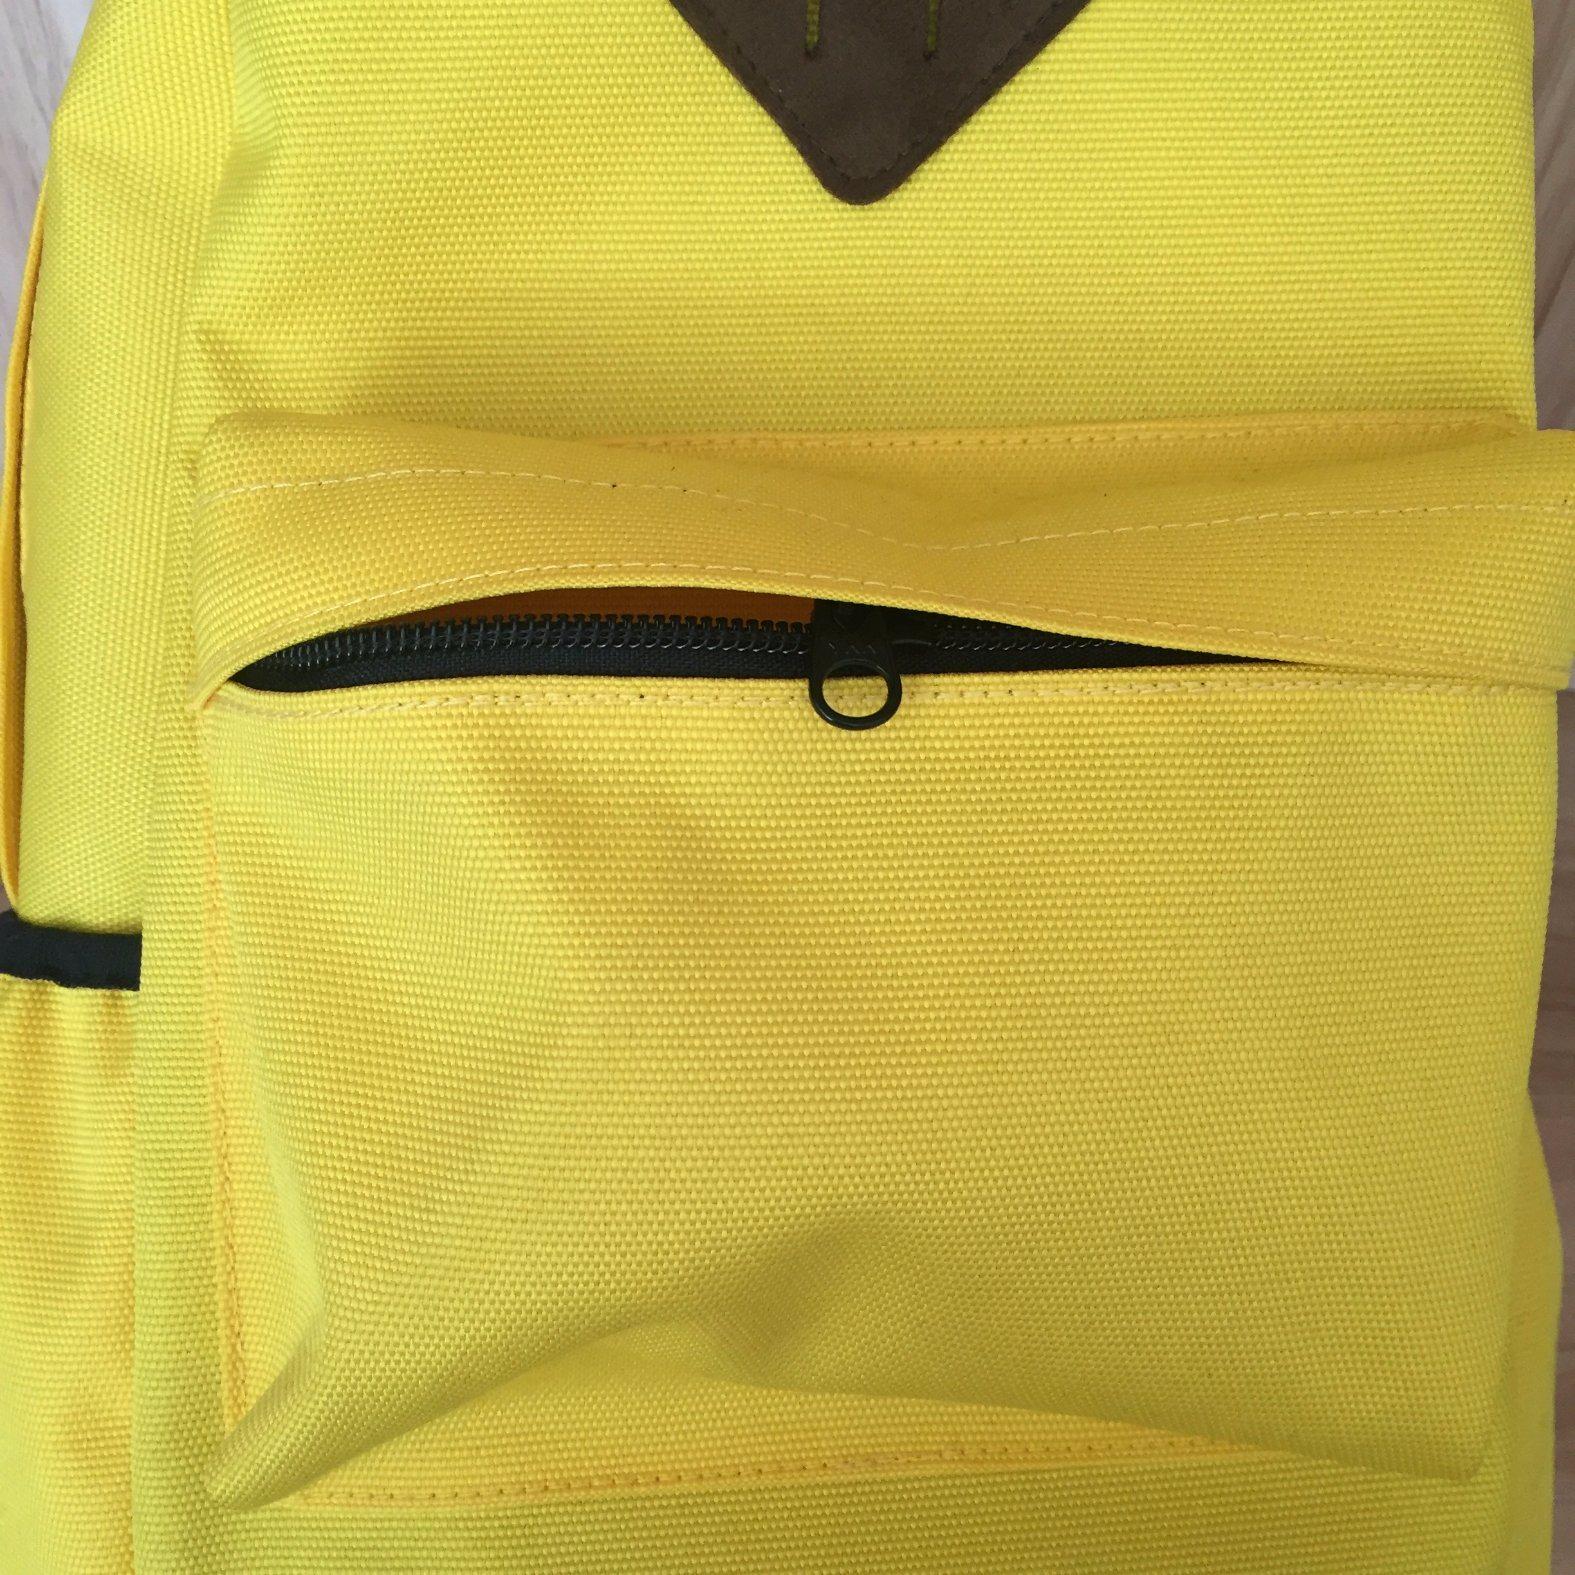 High Quality Fashion Outdoor Campus Oxford Cloth Bag